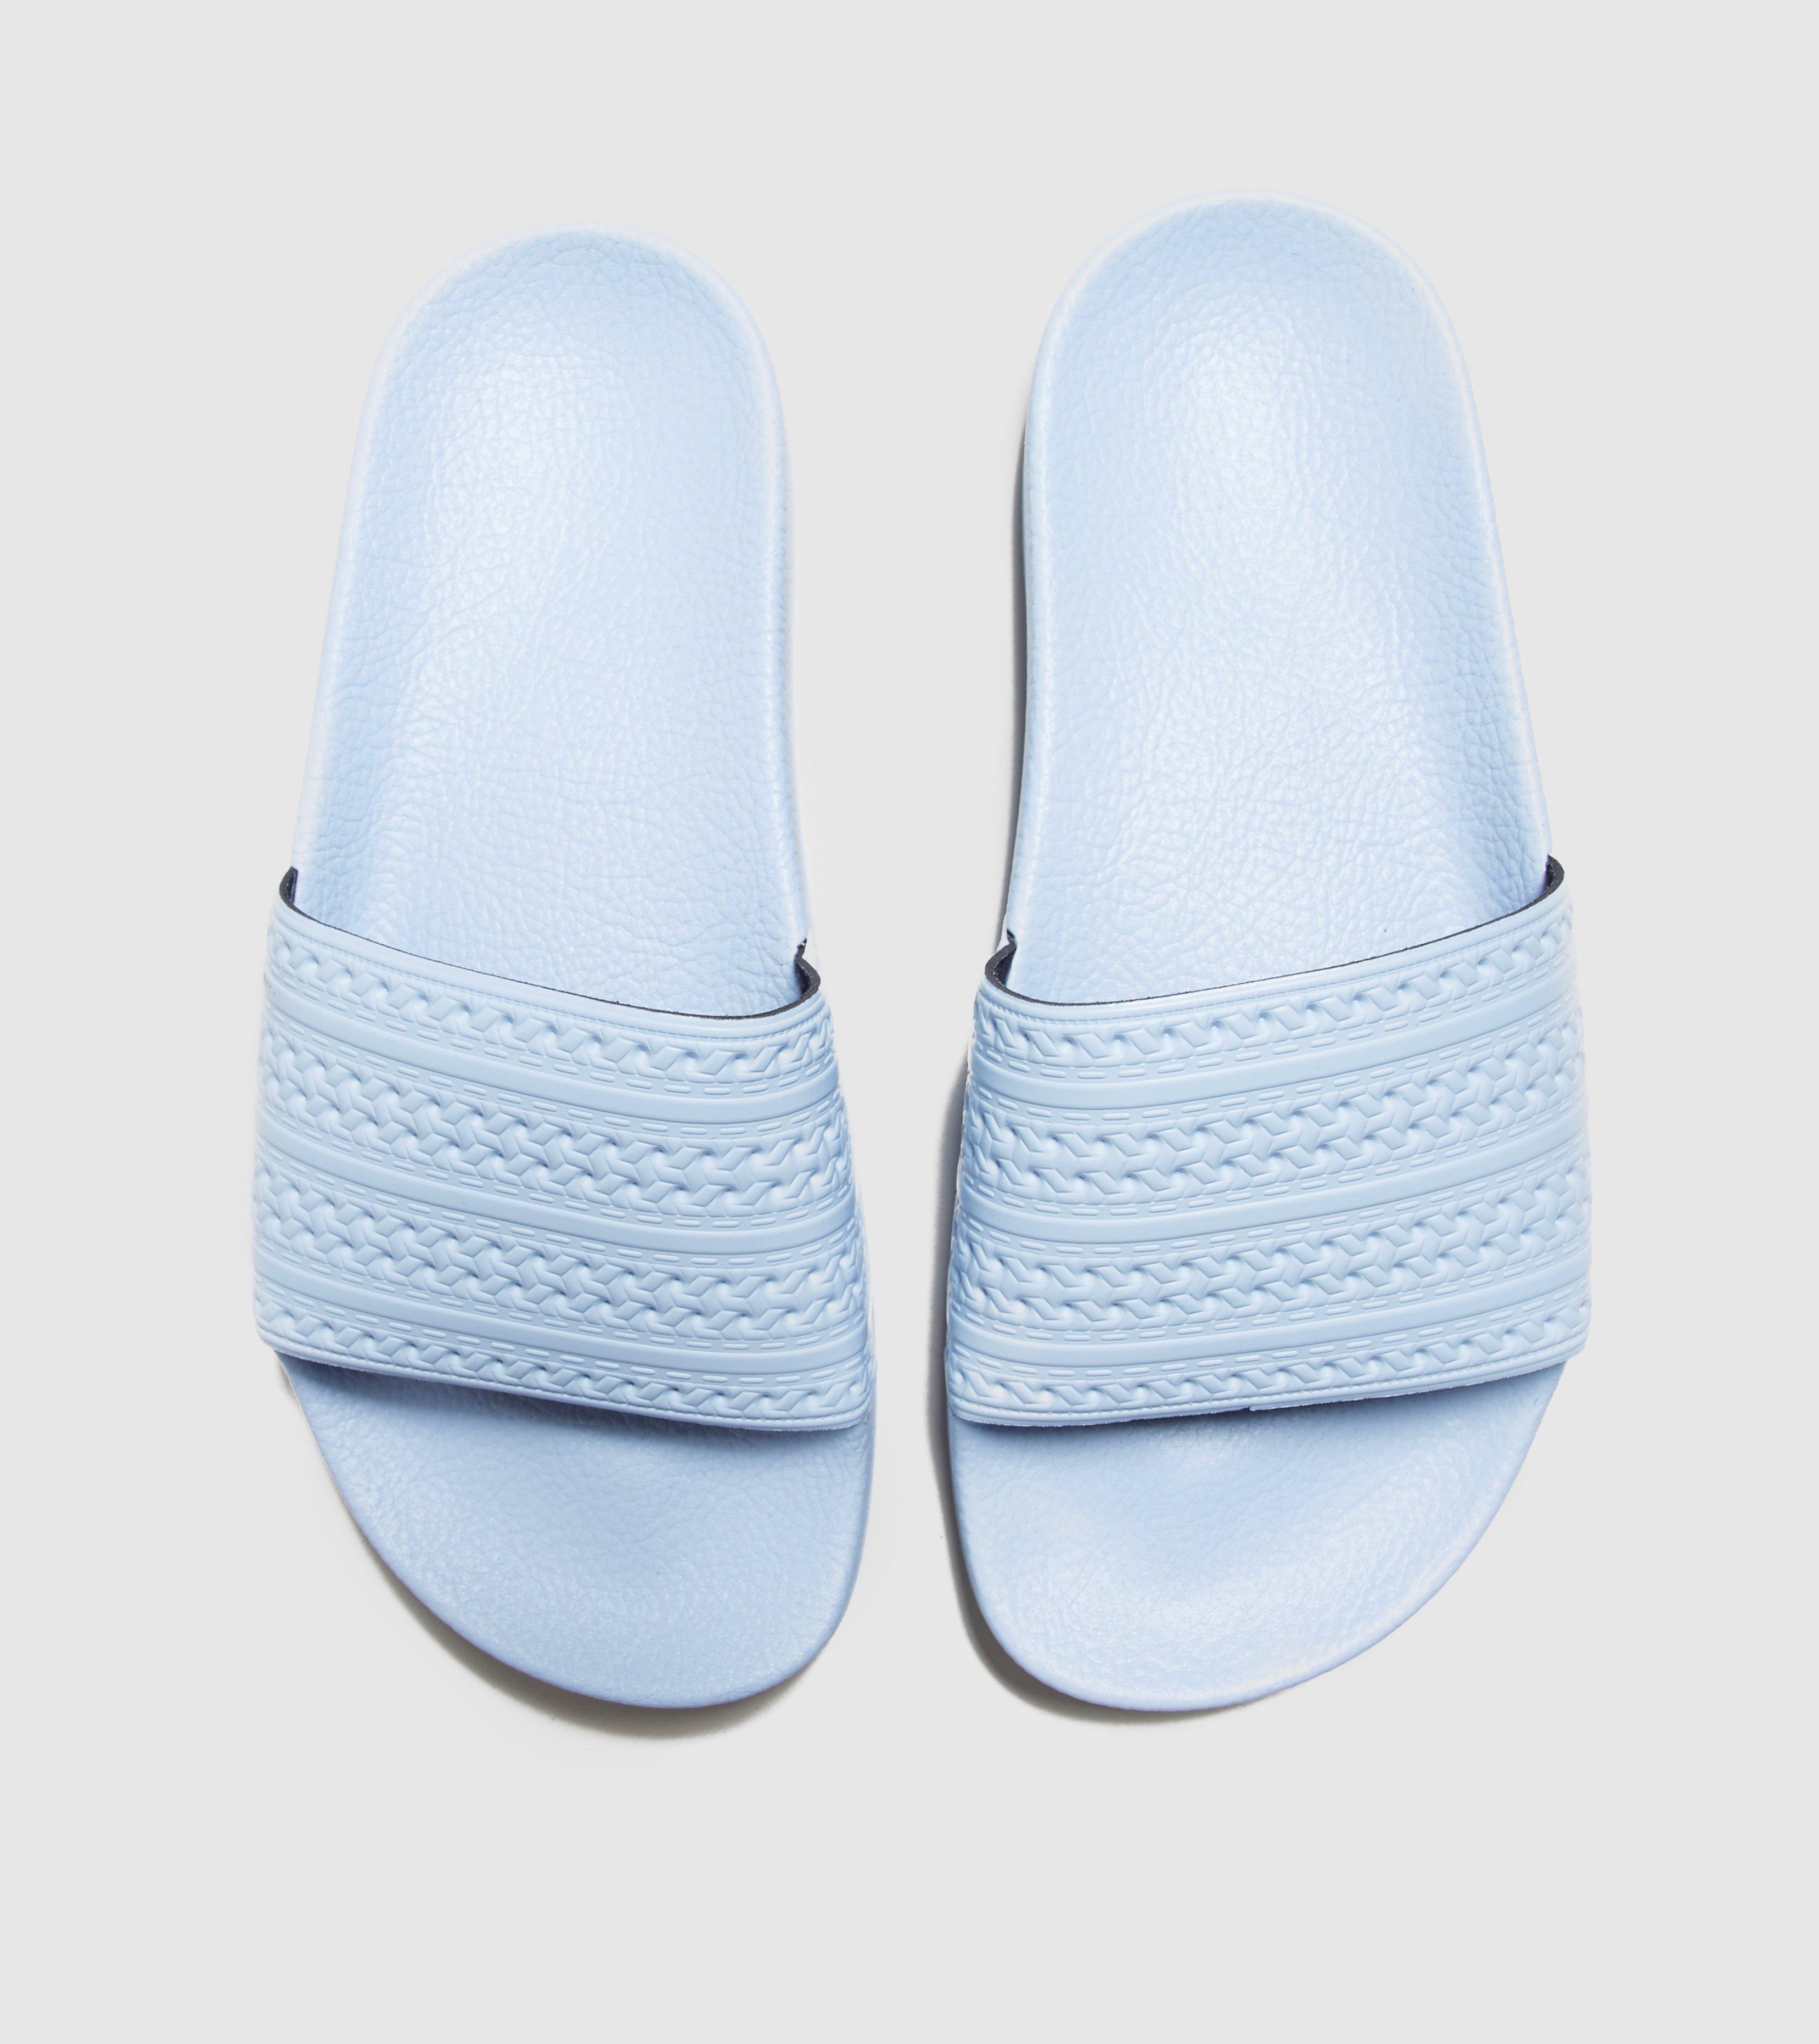 b32d43b528cebf Lyst - adidas Originals Adilette Slides Women s in Blue